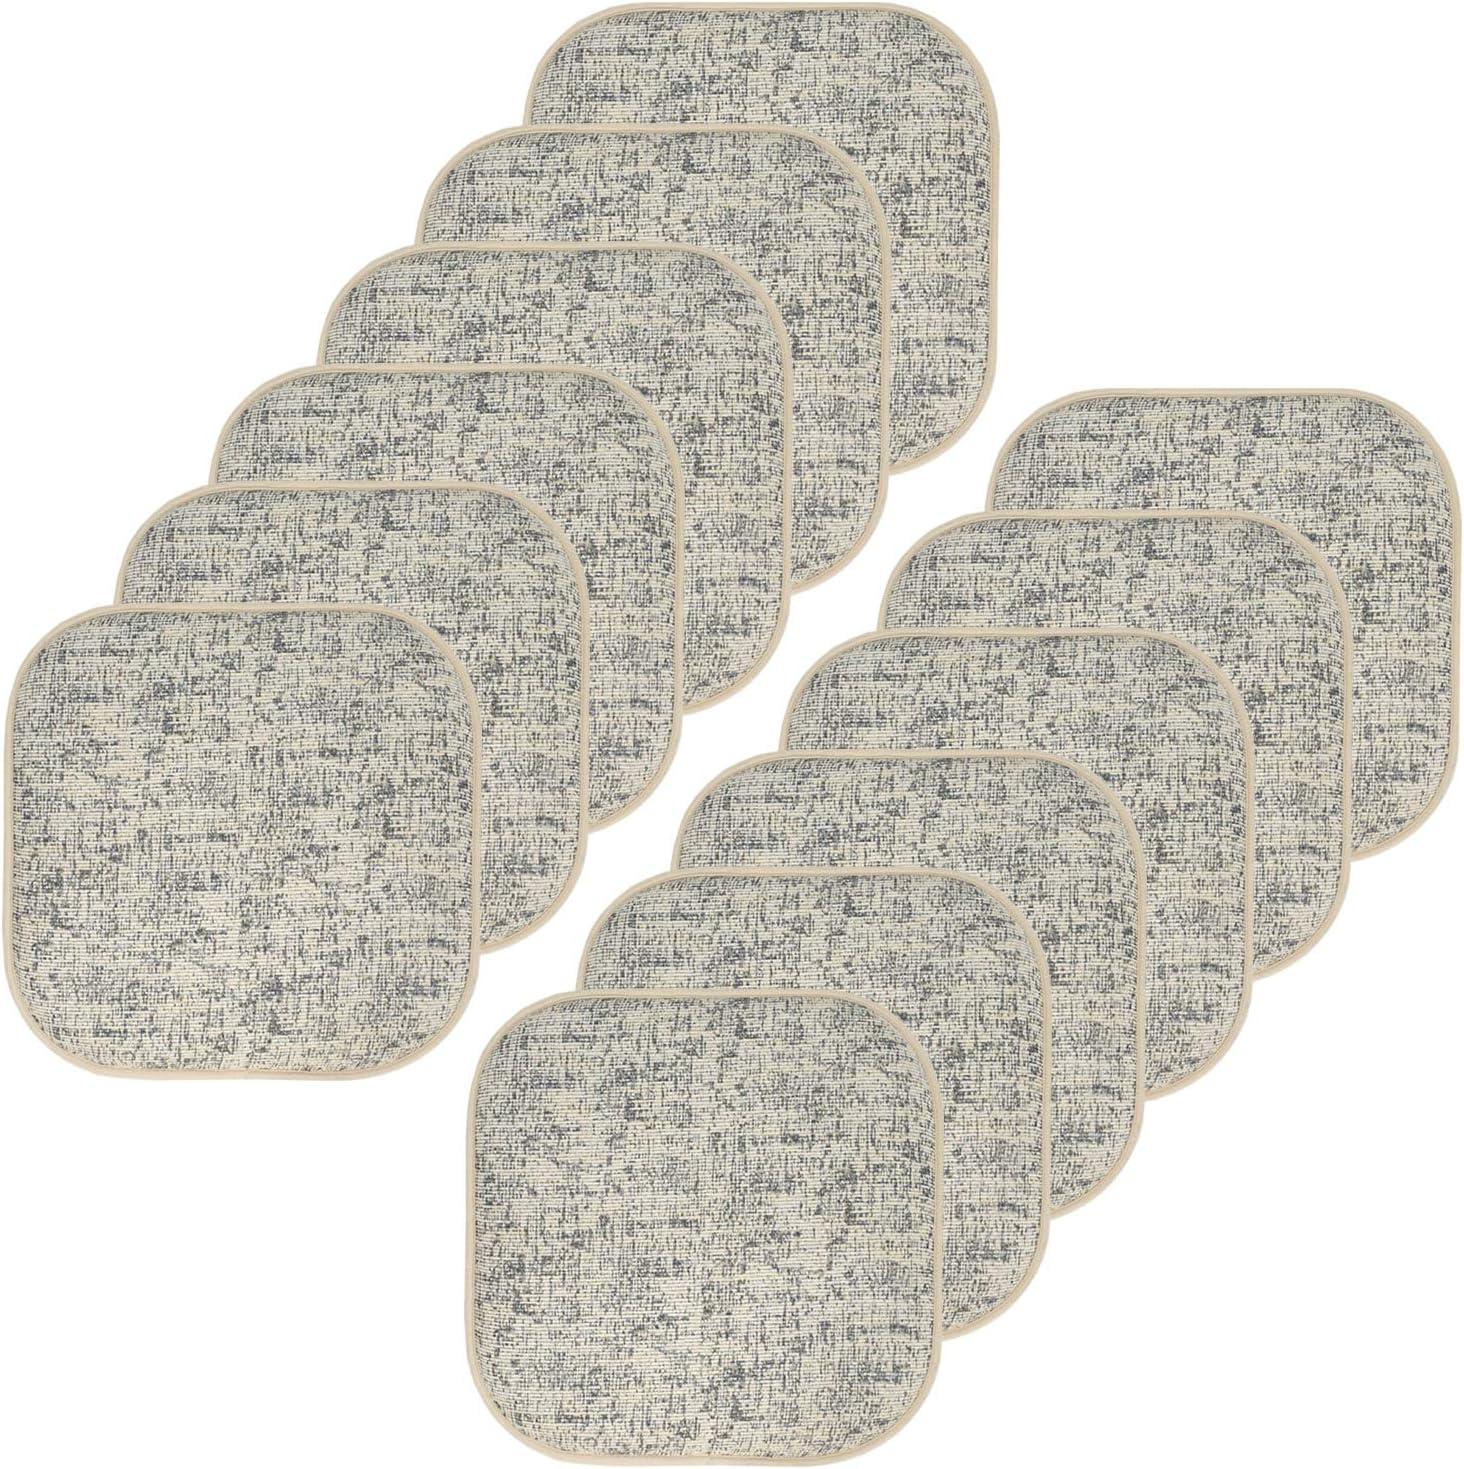 Sweet 在庫あり Home Collection Chair Cushion P Pads Honeycomb デポー Foam Memory